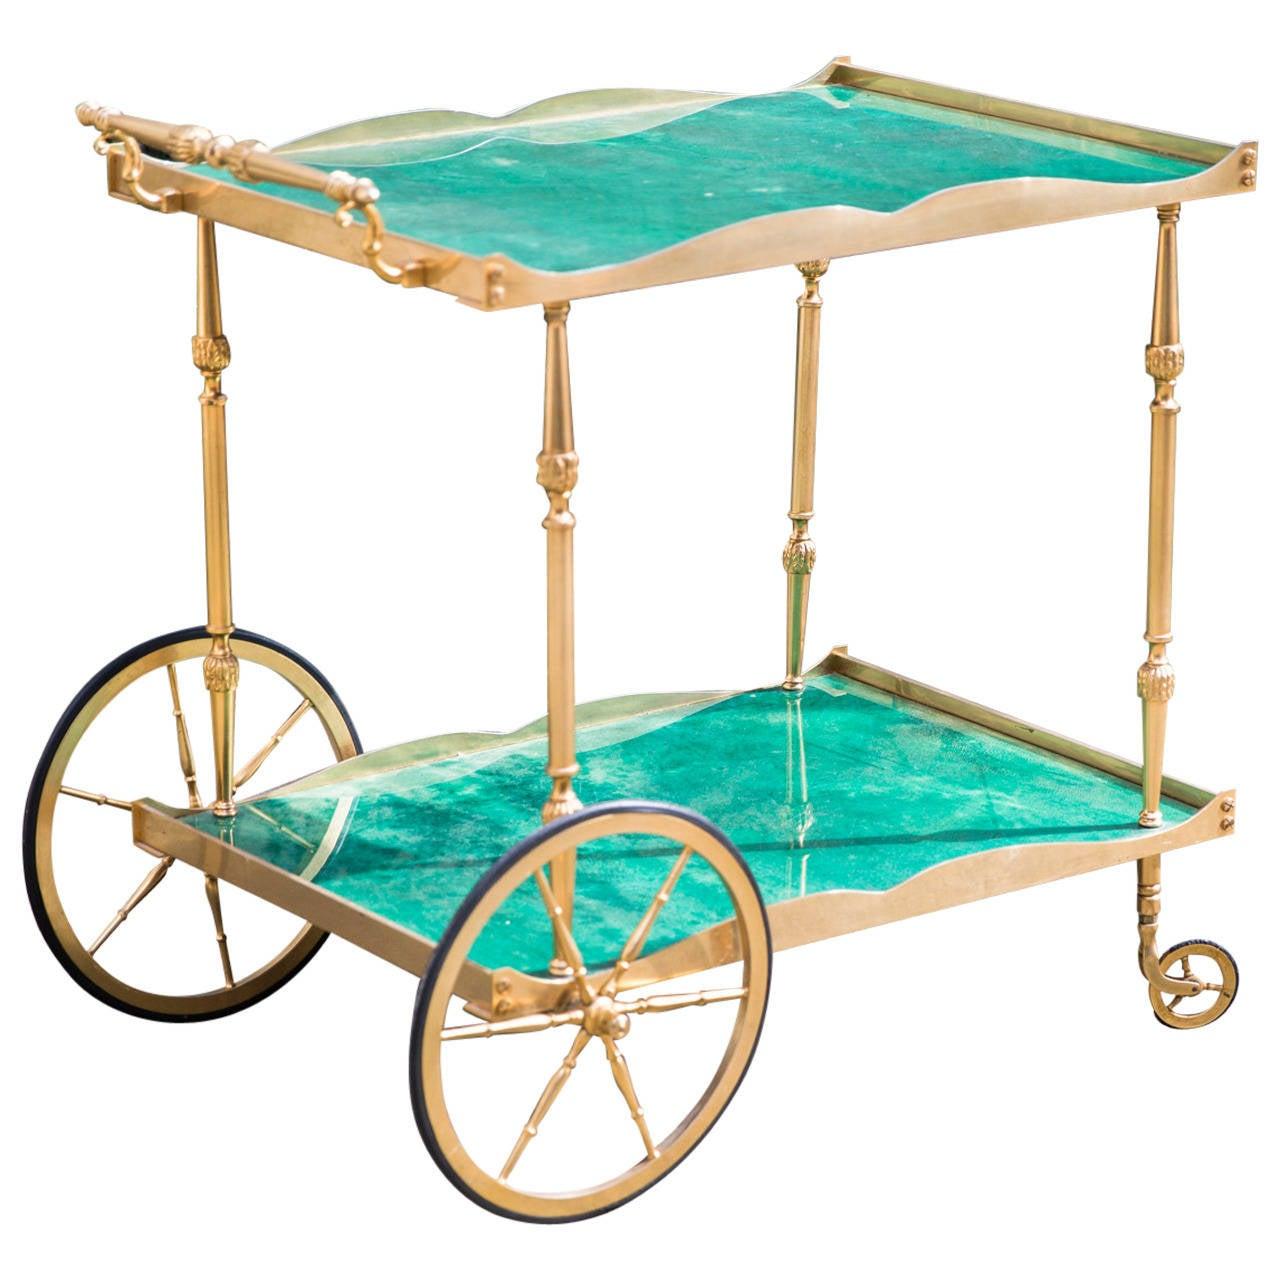 Aldo Tura Bar Cart For Sale at 1stdibs